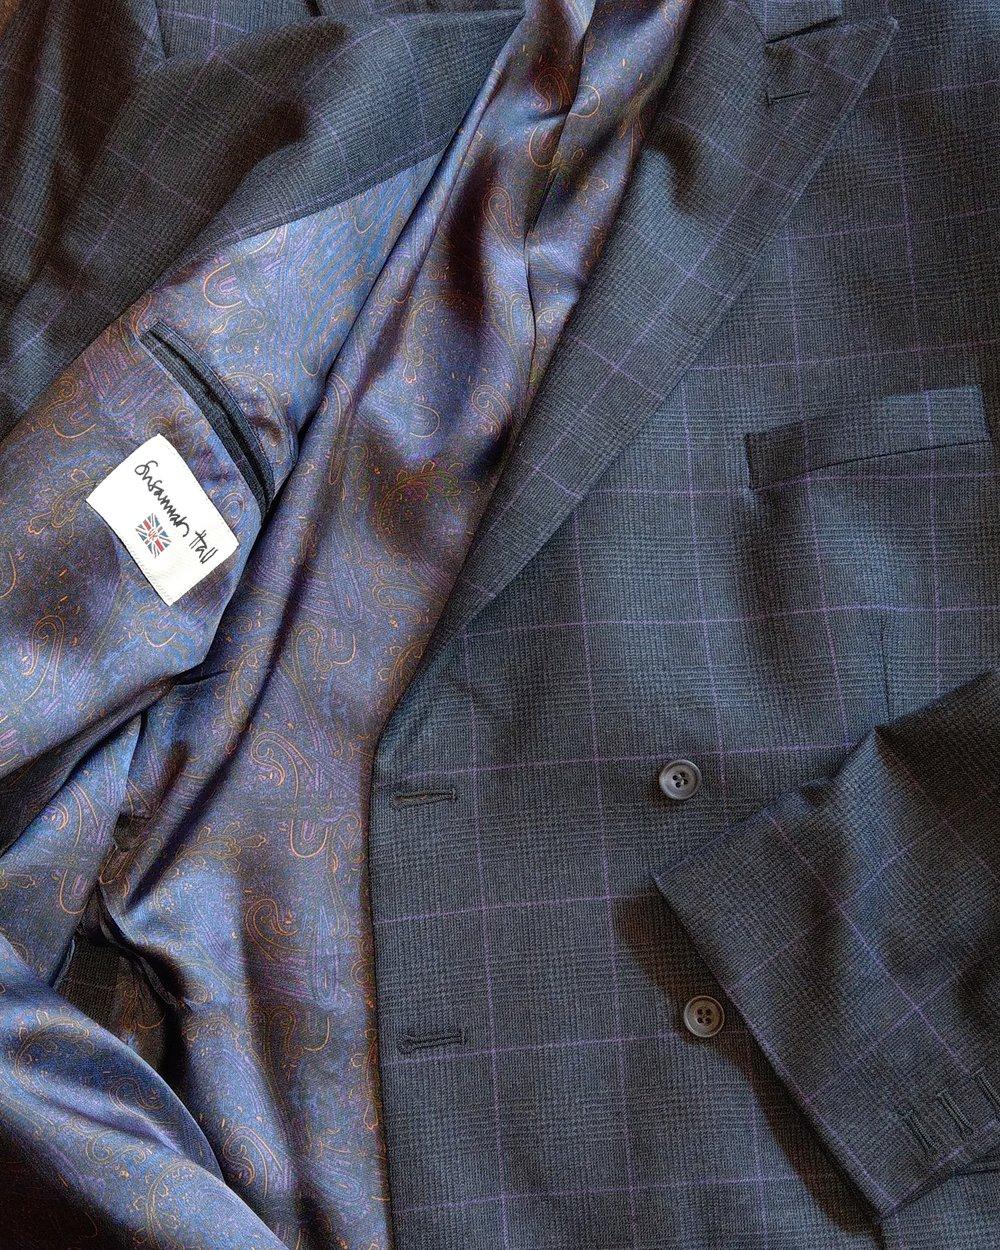 grey-purple-check-flannel-holland-sherry-susannah-hall-tailor-bespoke-suit-made-uk-british.jpg